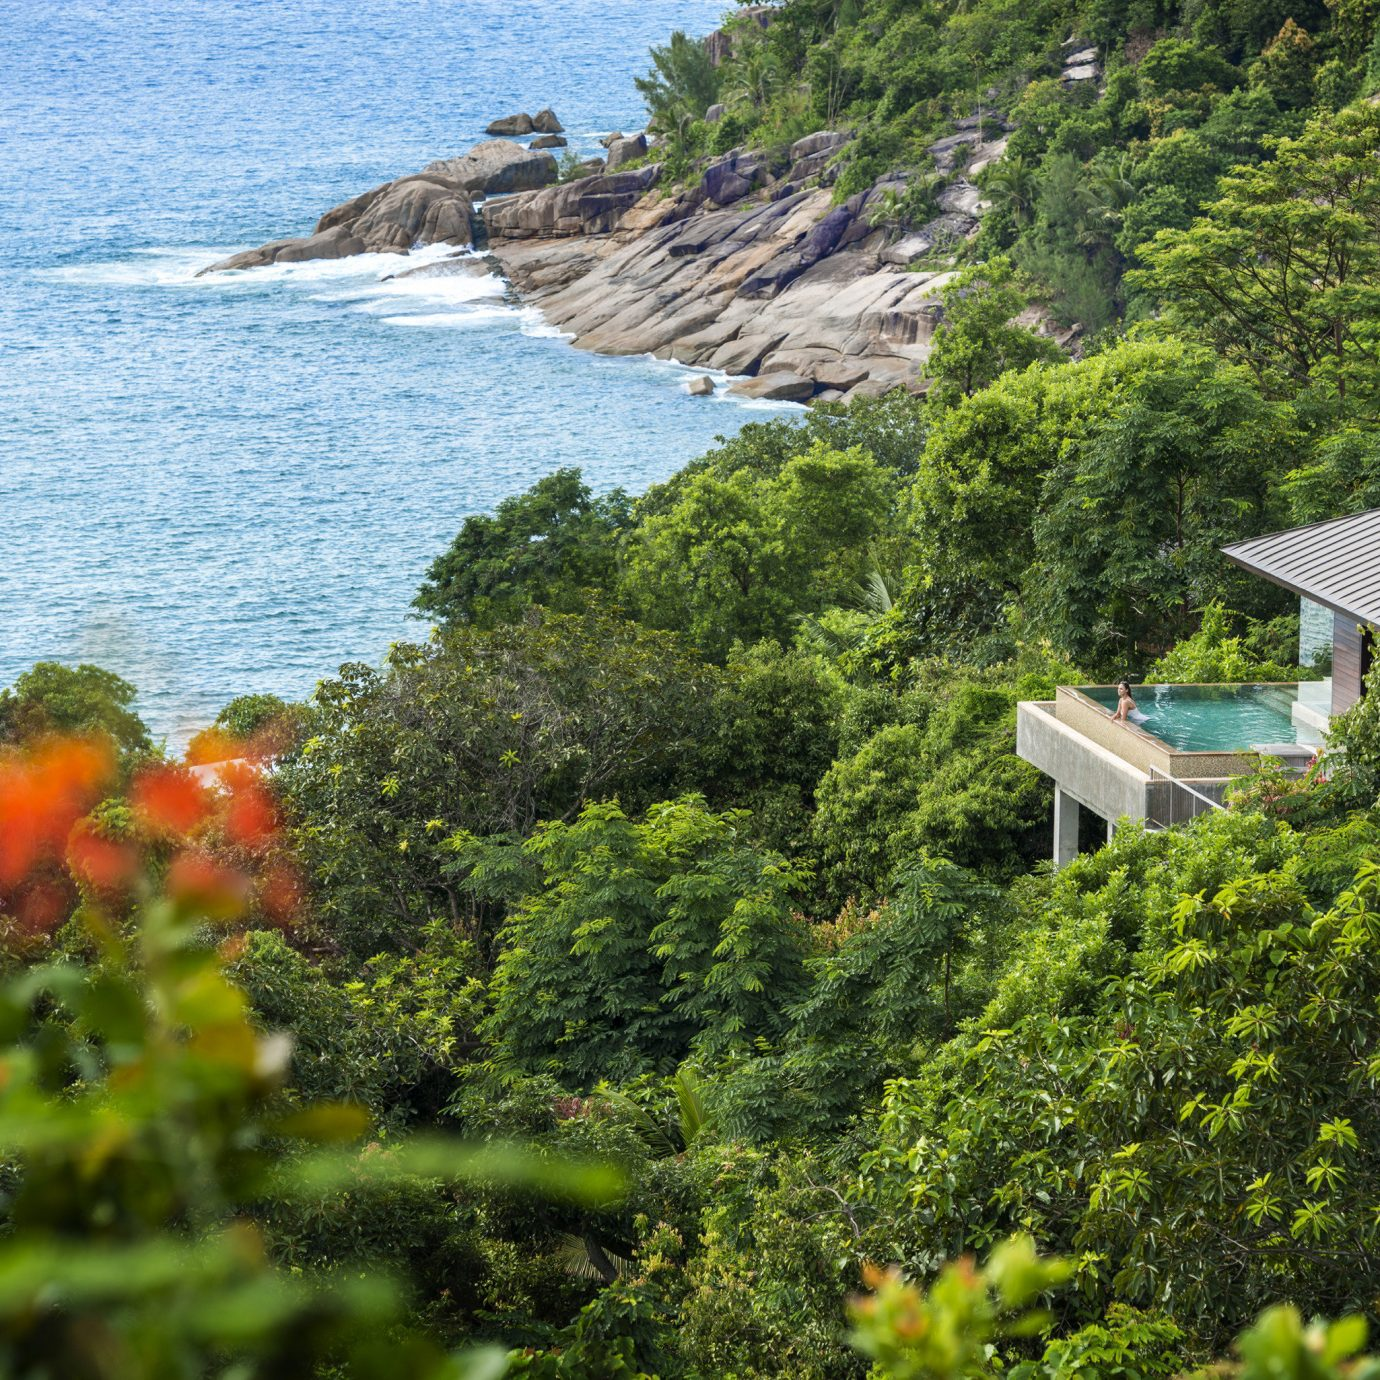 Hotels tree outdoor water vegetation ecosystem Nature Coast vacation flower Jungle Sea rainforest lush surrounded